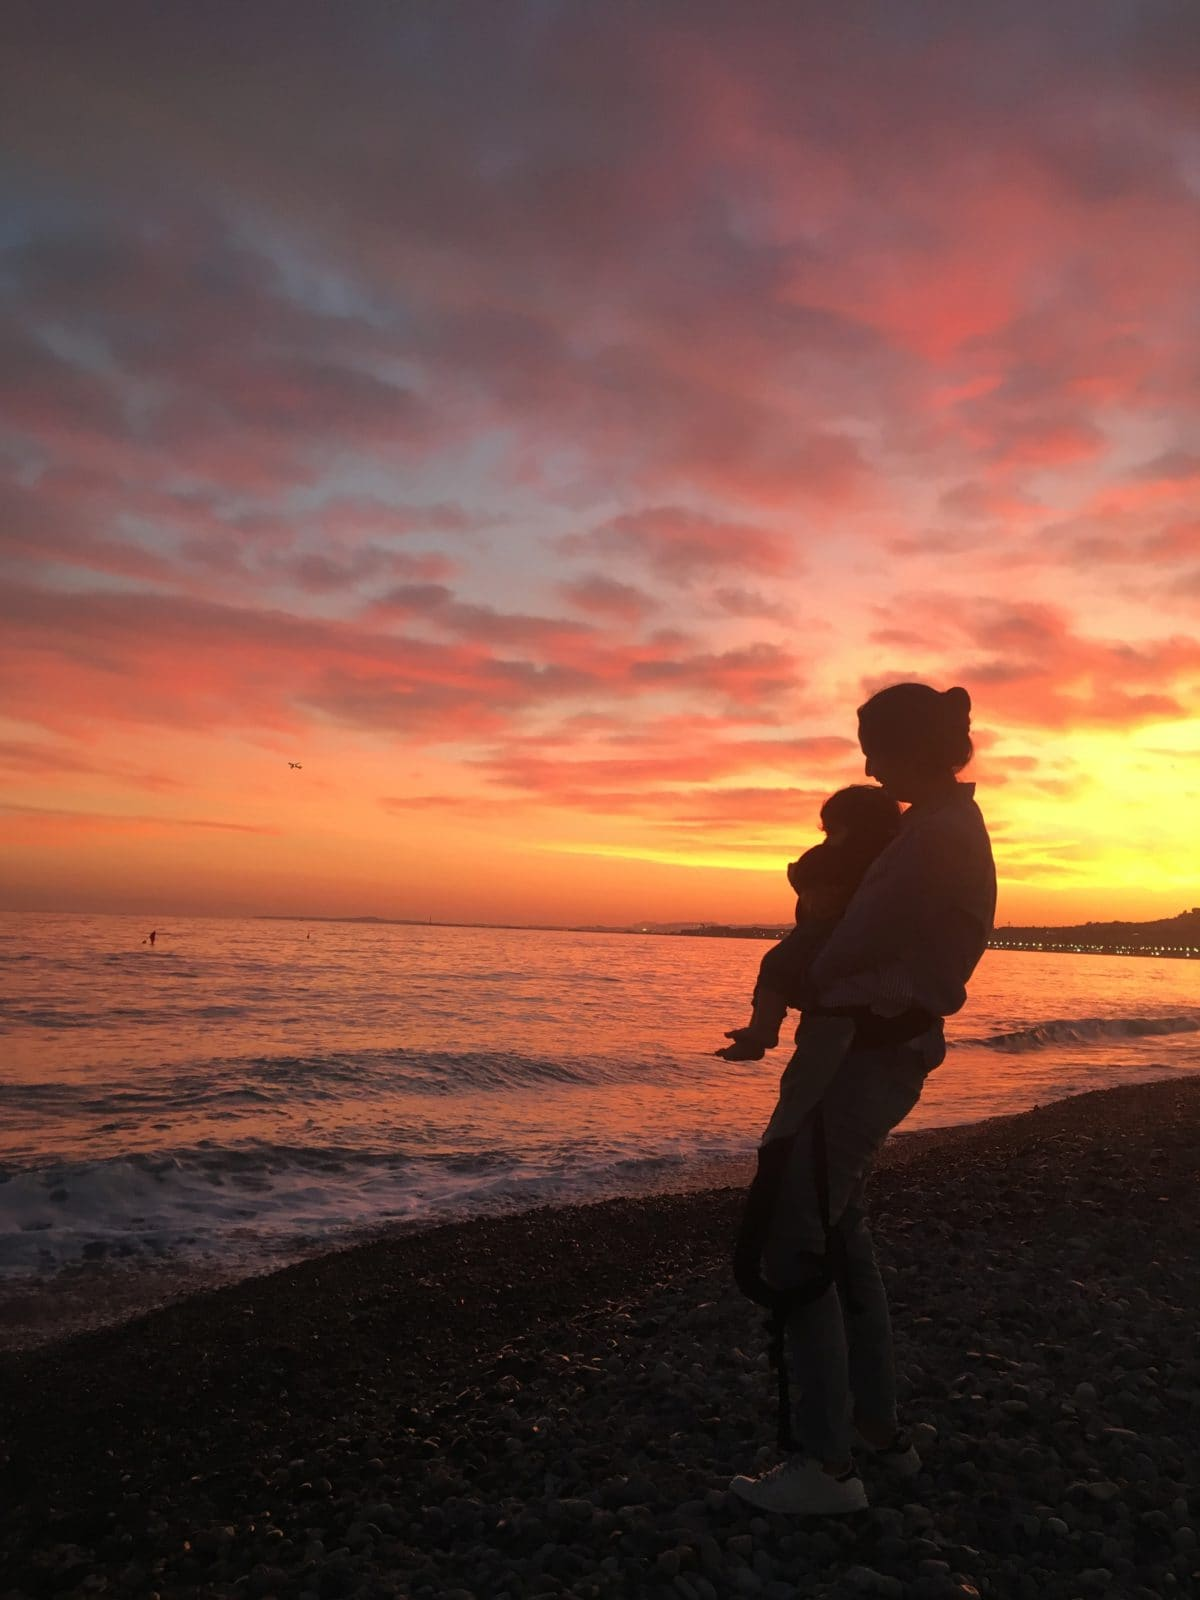 Sunset on the beach in Nice